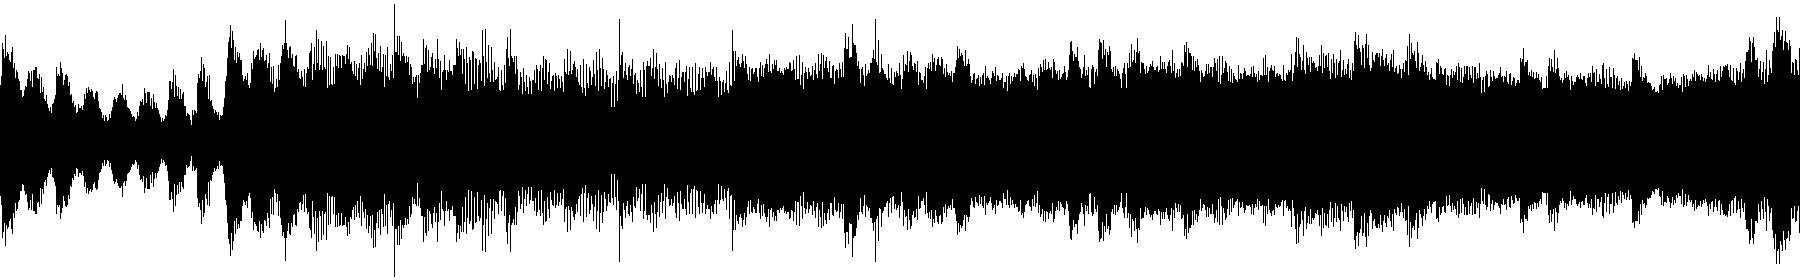 vedh melodyloop 083 am g d 124bpm